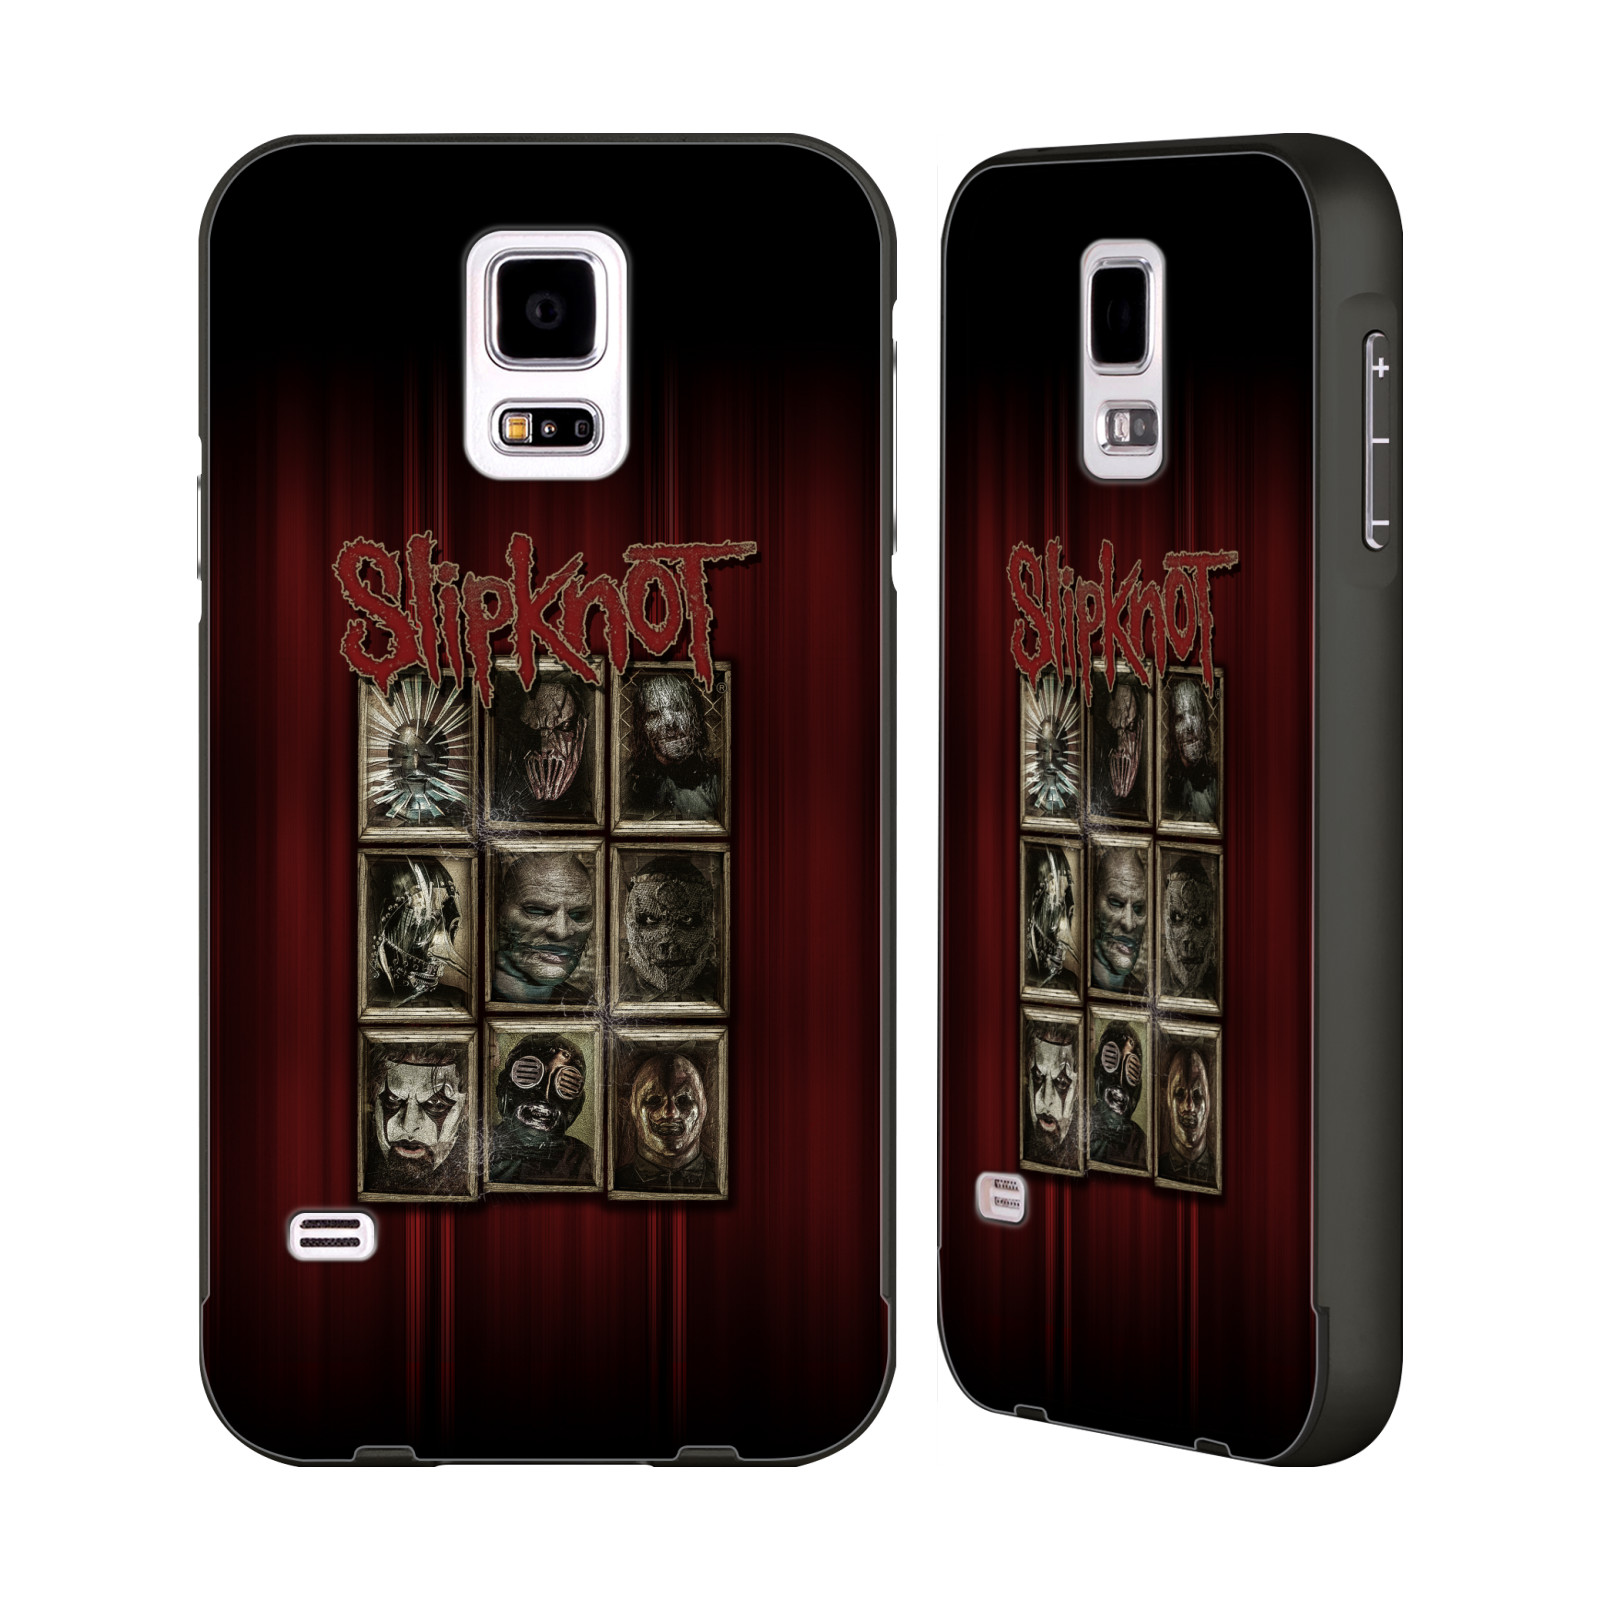 Case Design slipknot phone case Cell Phones u0026 Accessories u0026gt; Cell Phone Accessories u0026gt; Cases, Covers ...